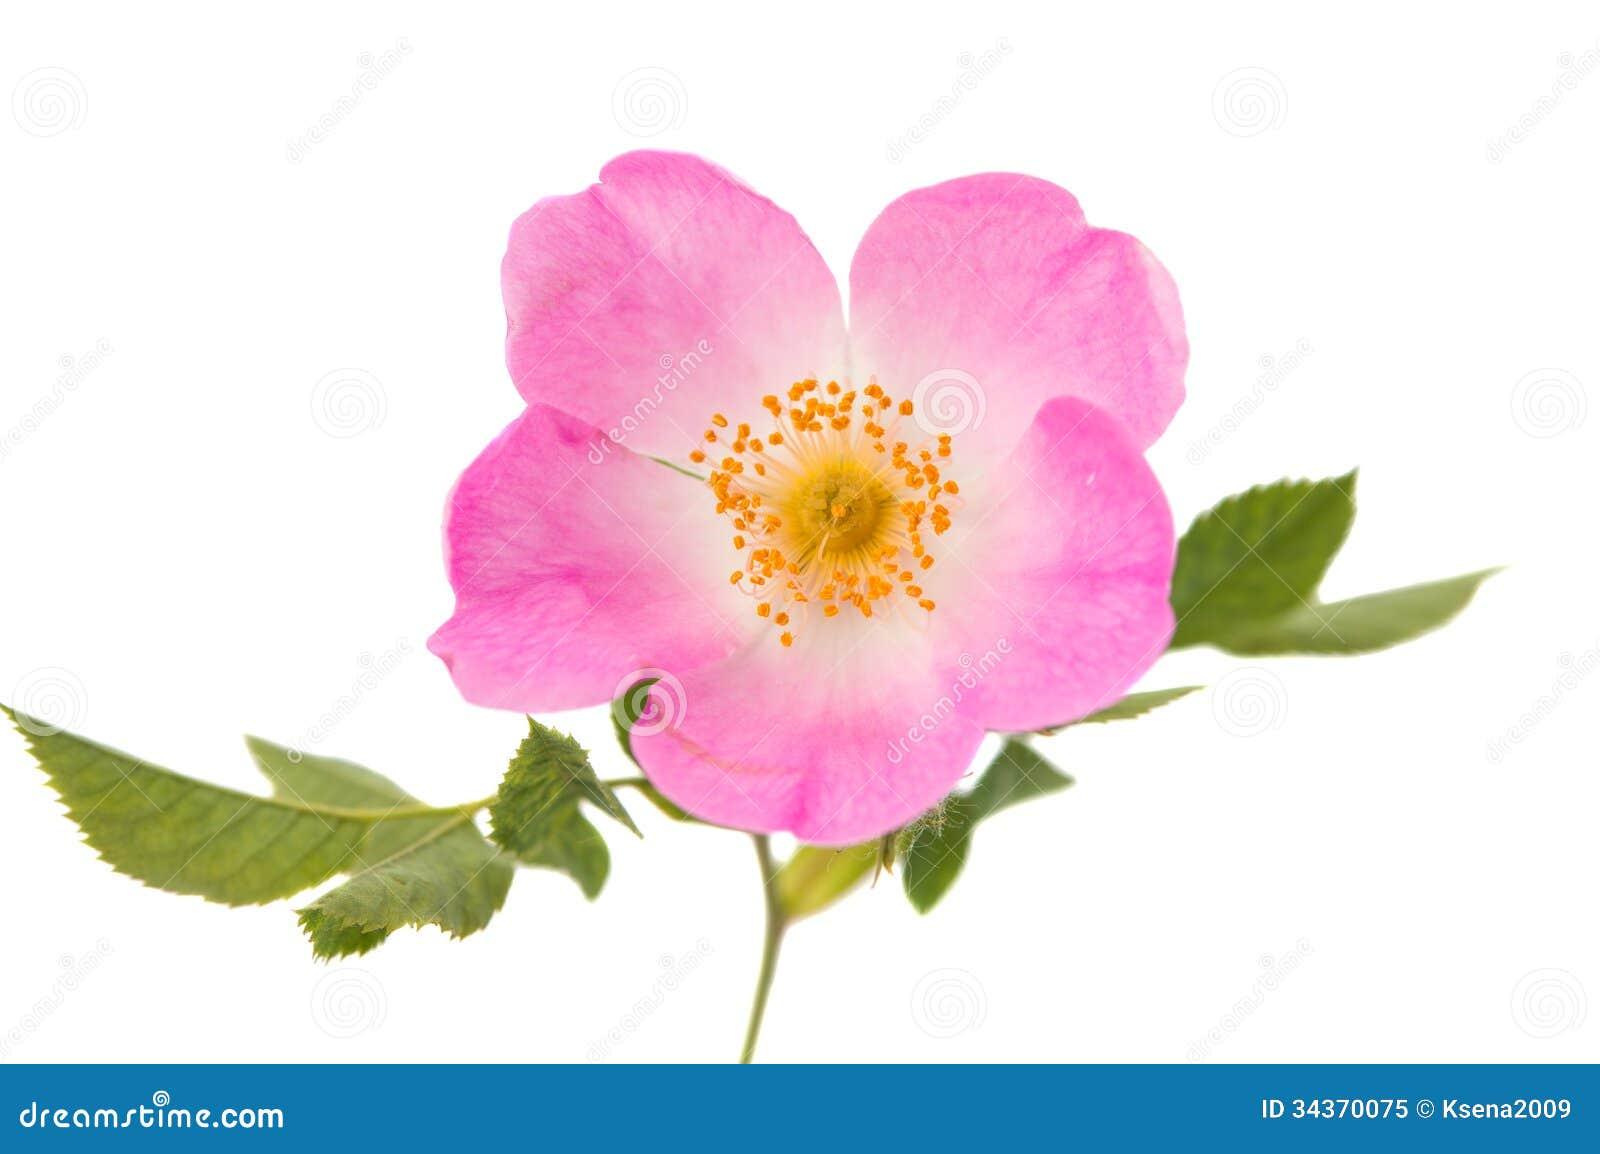 Wild Rose Flower Stock Image Image Of Closeup Medicine